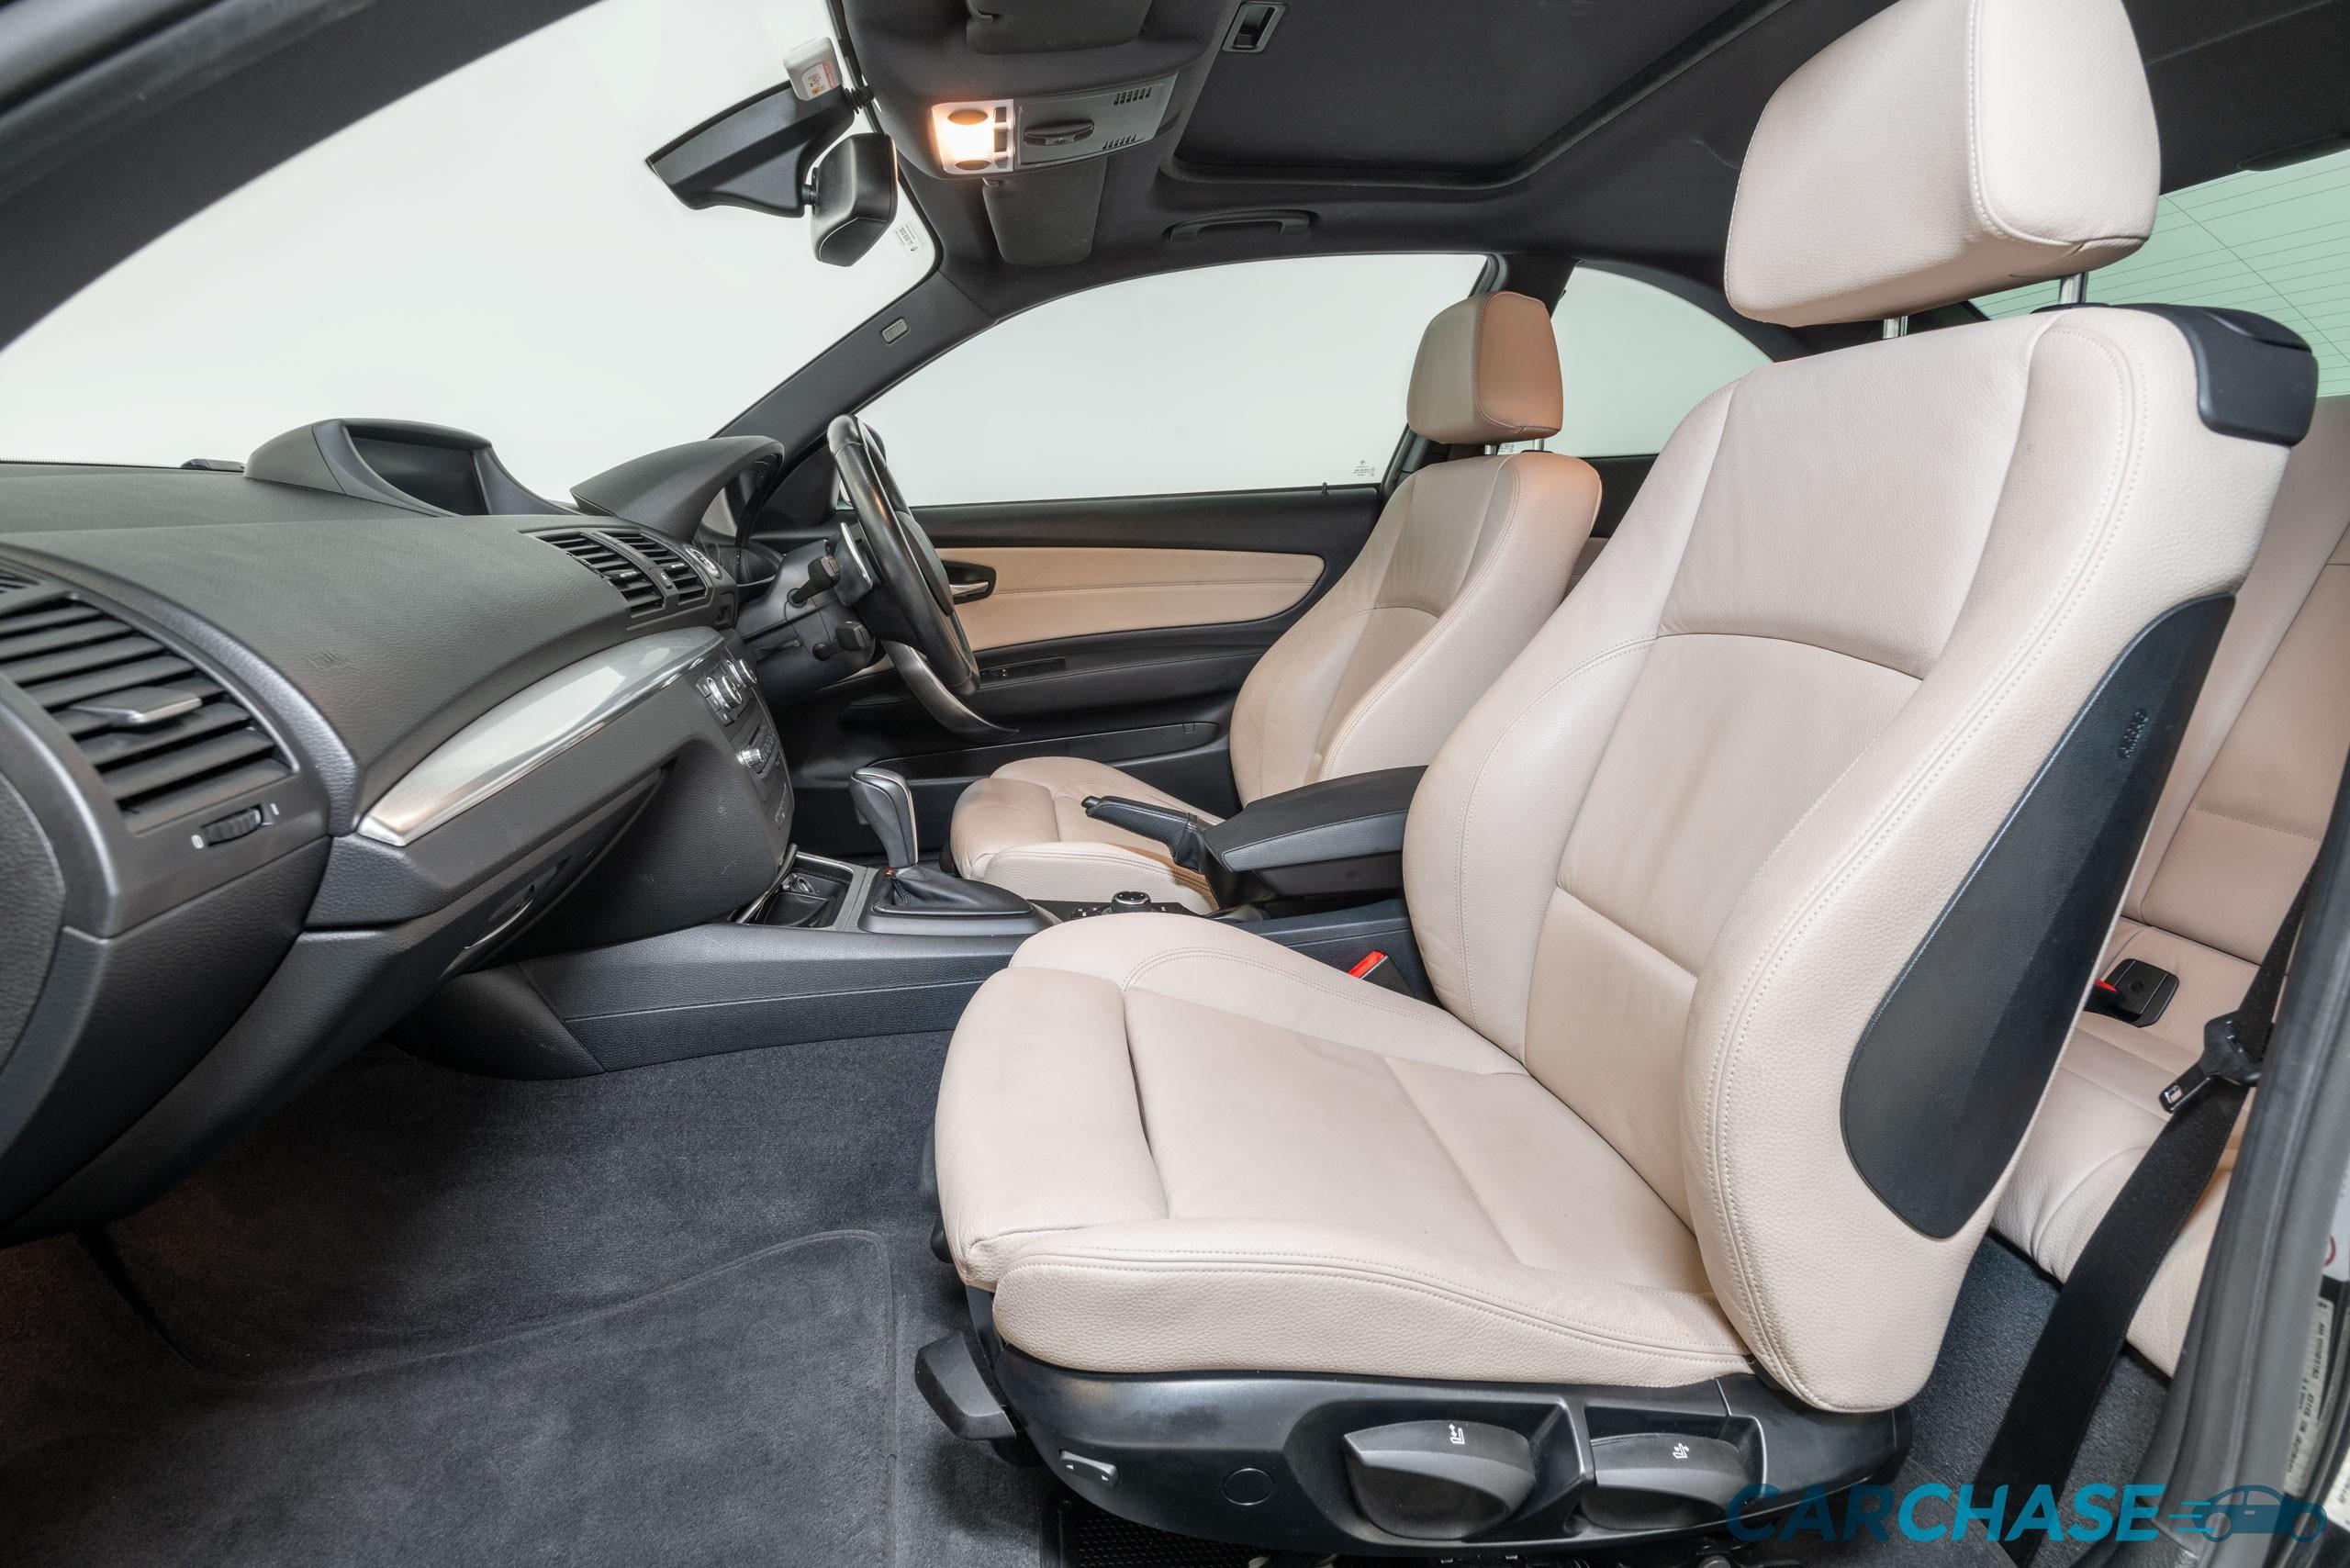 Image of passenger front profile of 2011 BMW 125i